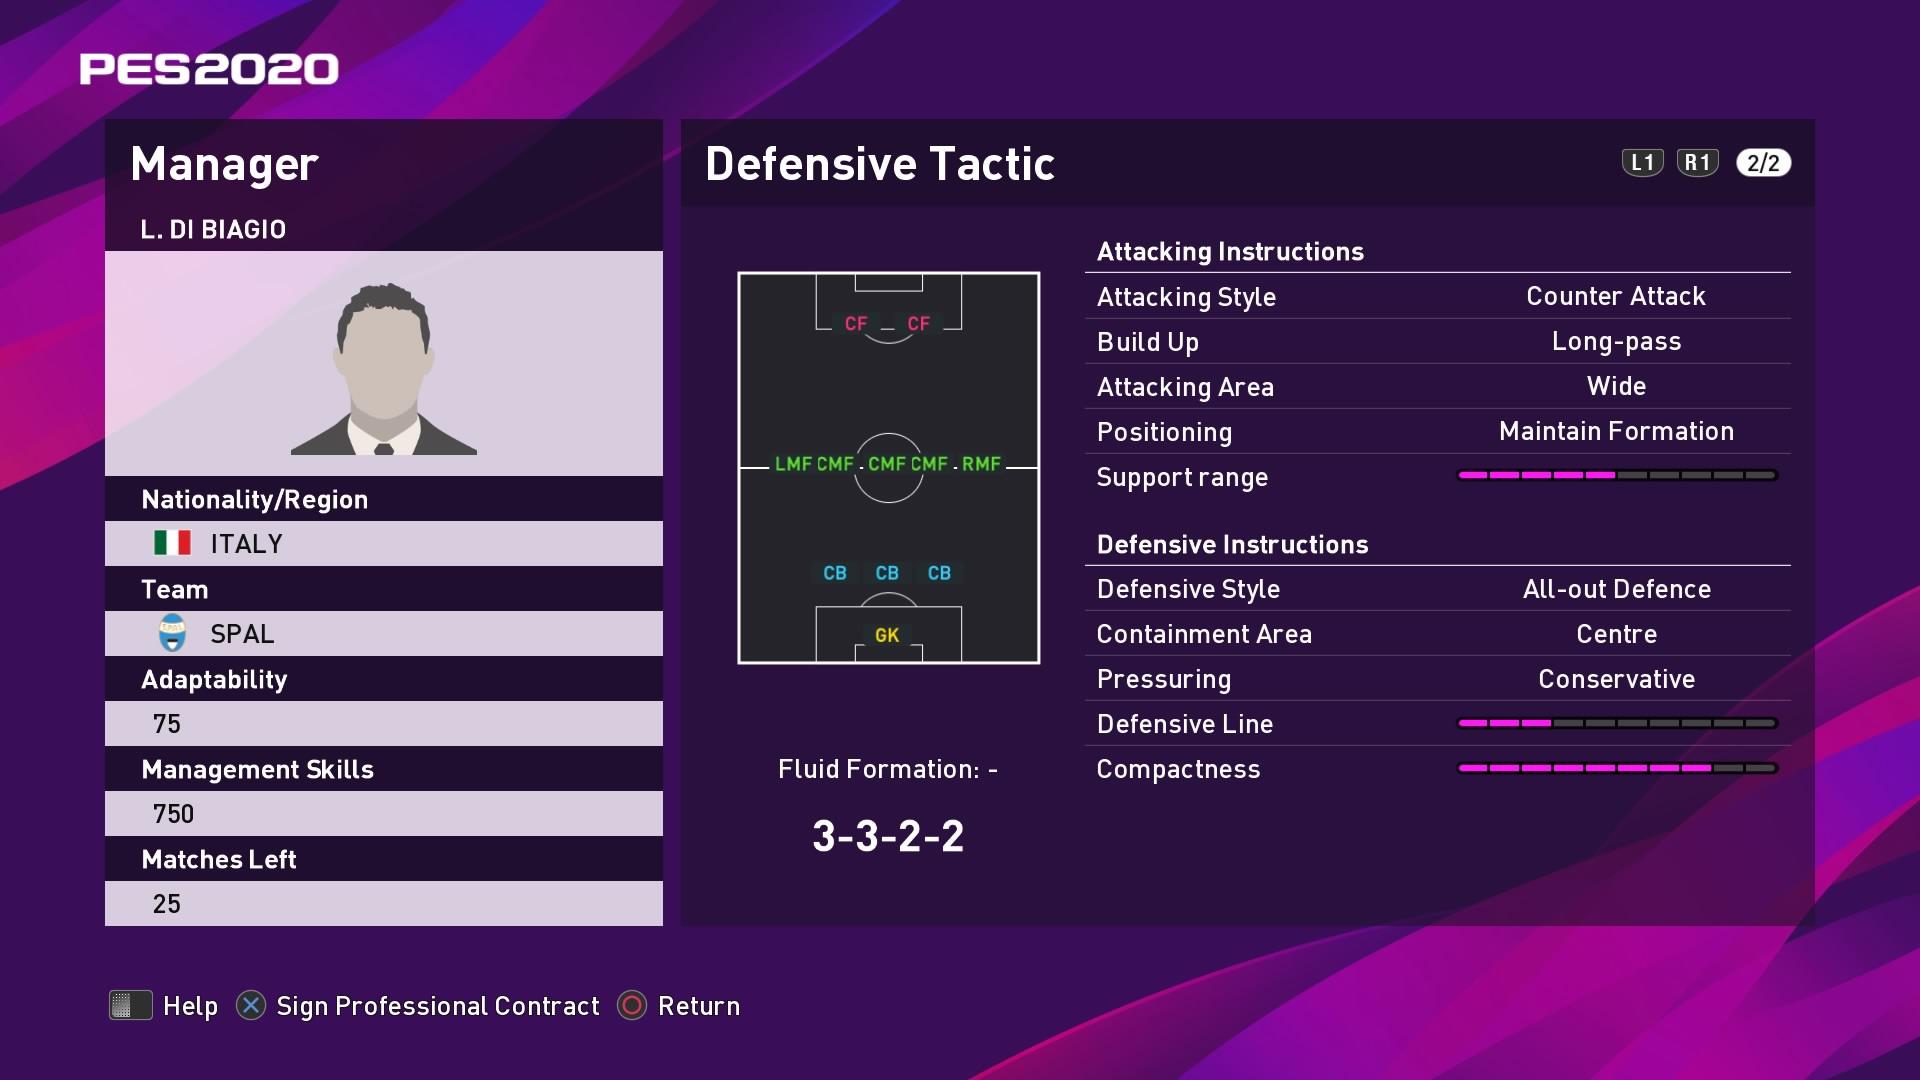 L. Di Biagio (Luigi Di Biagio) Defensive Tactic in PES 2020 myClub